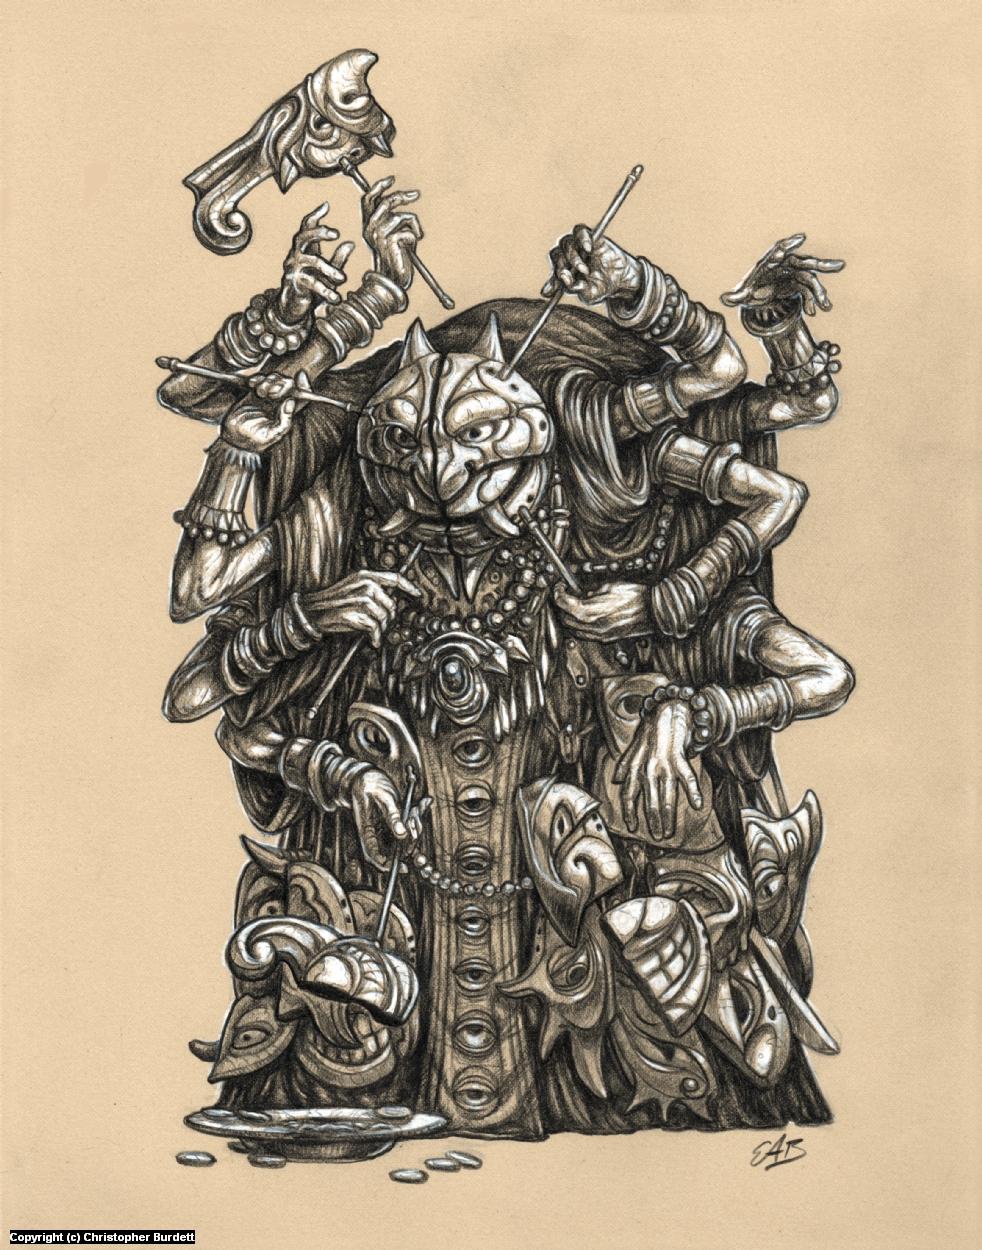 Dight-Kin Artwork by Christopher Burdett